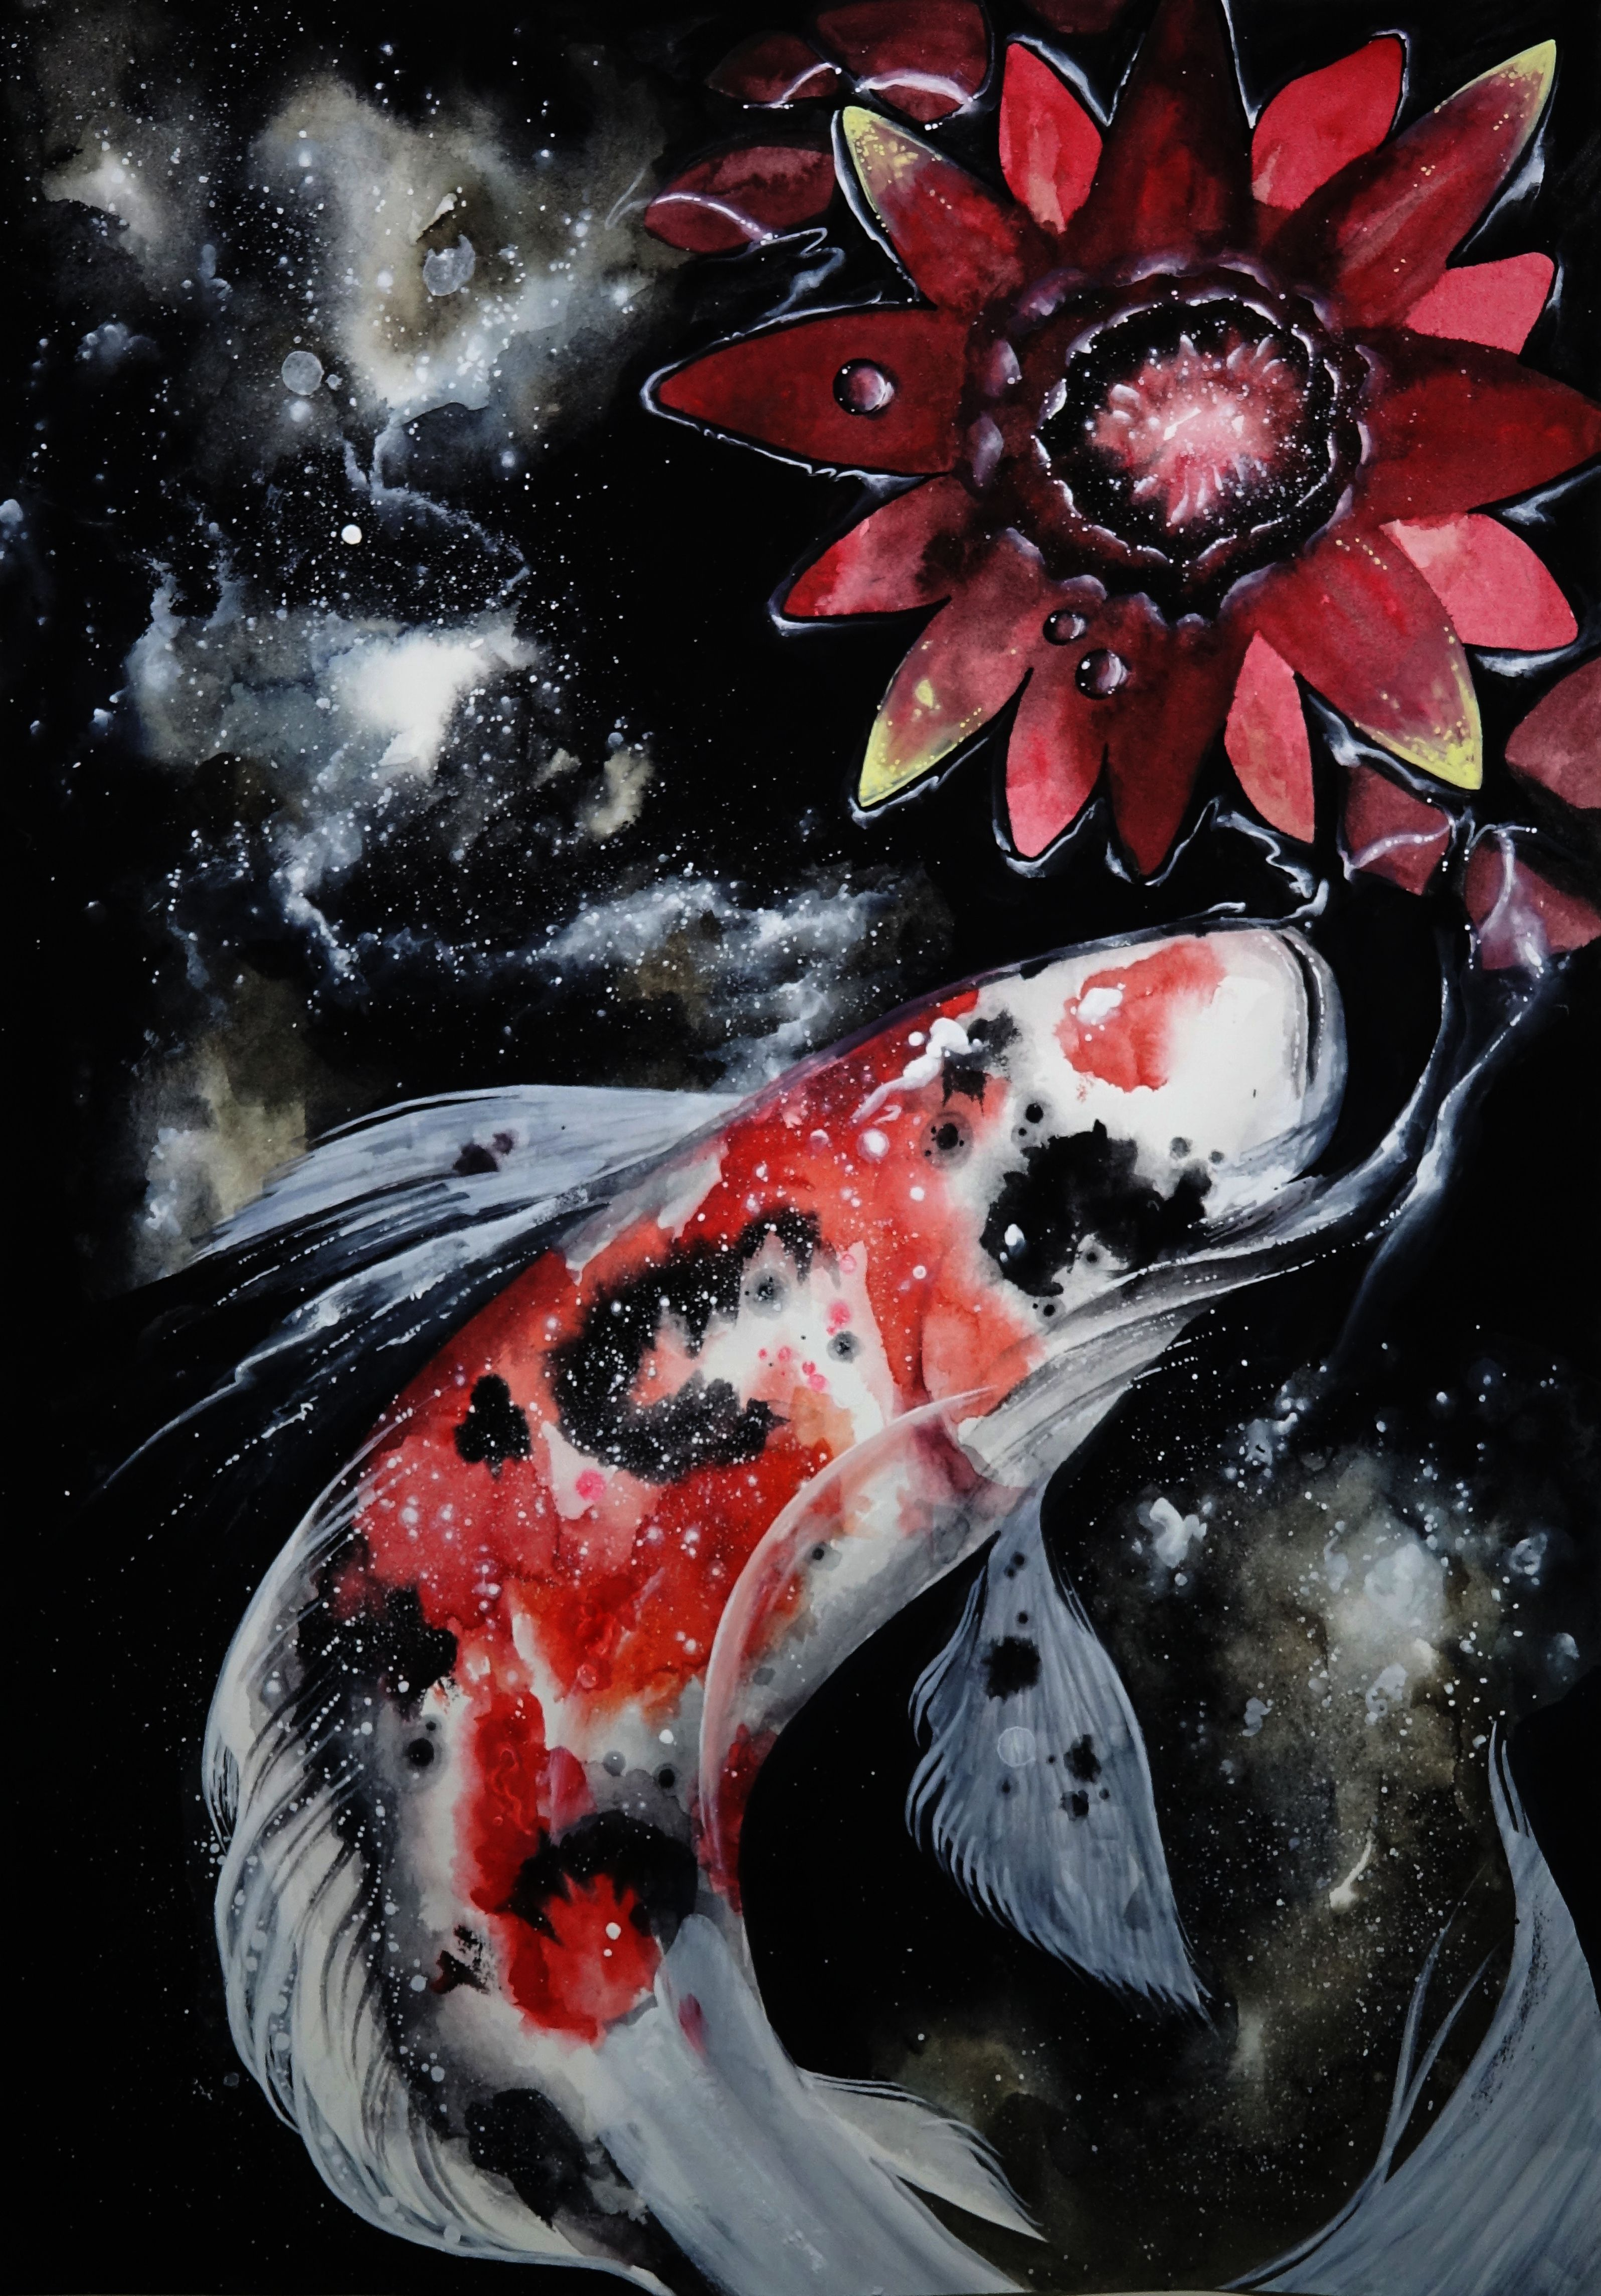 Koi Fish & Silent Pond | My Watercolor Paintings | Pinterest | Koi